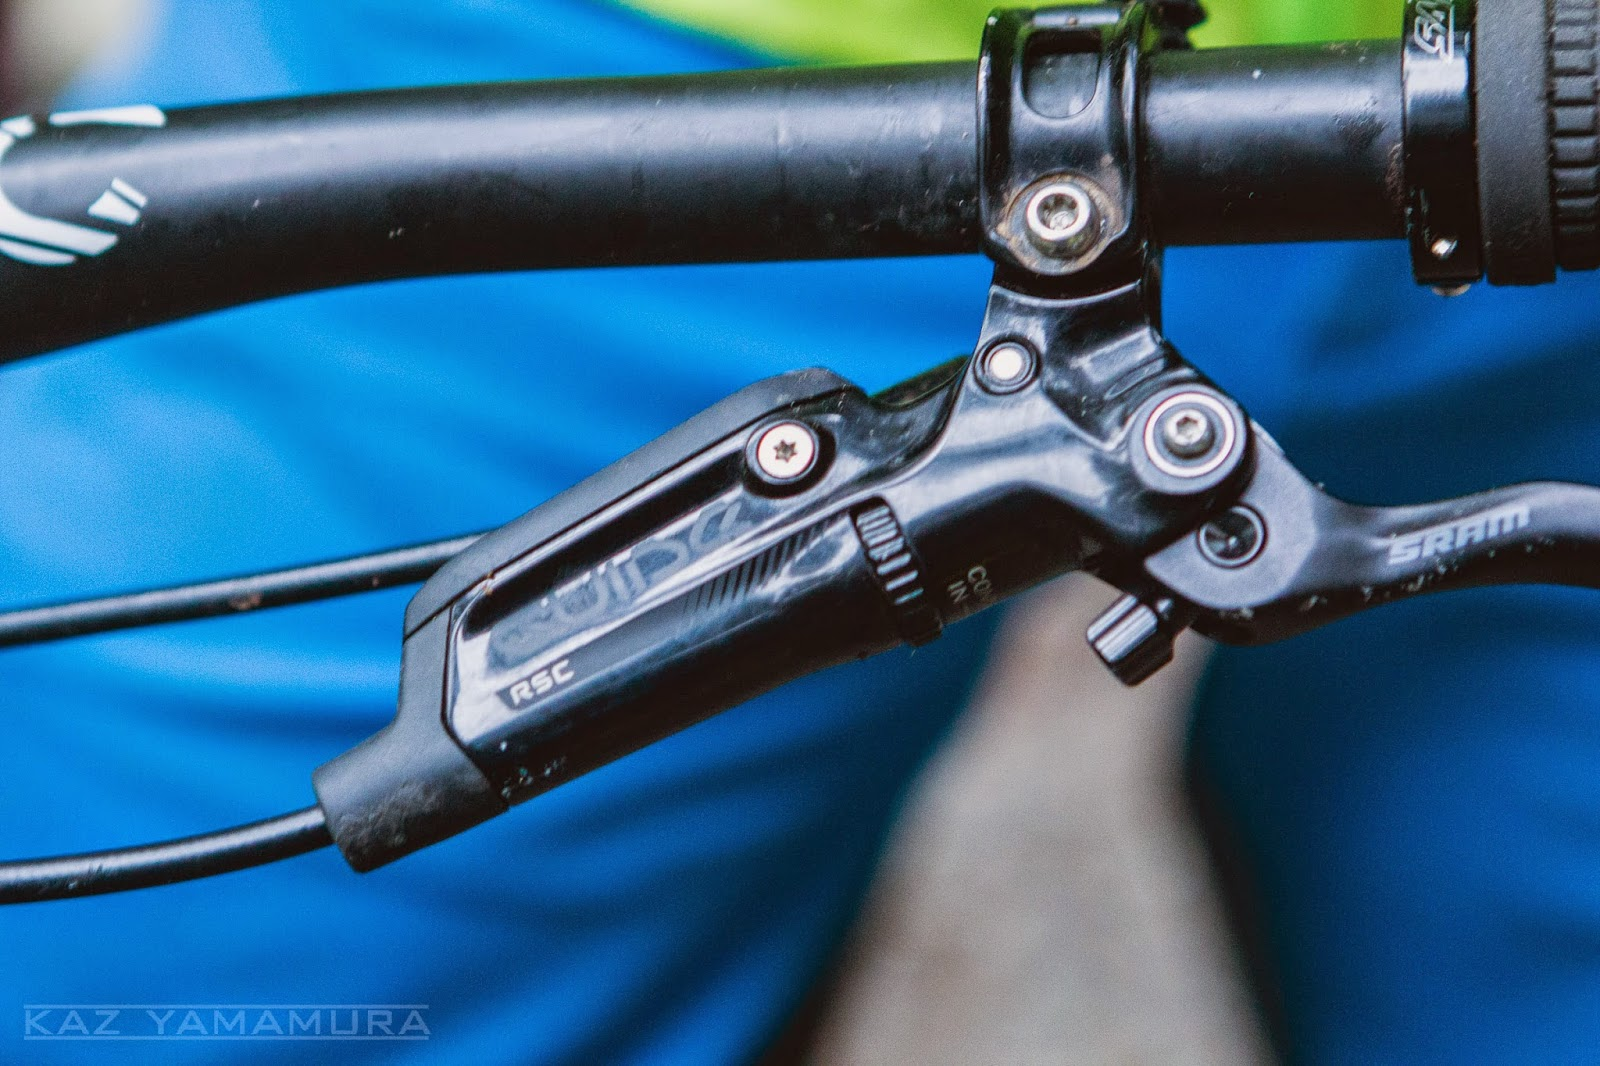 Bike News, Report, New Product, New Technology, Look Closer, SRAM brakeset, new SRAM brakeset